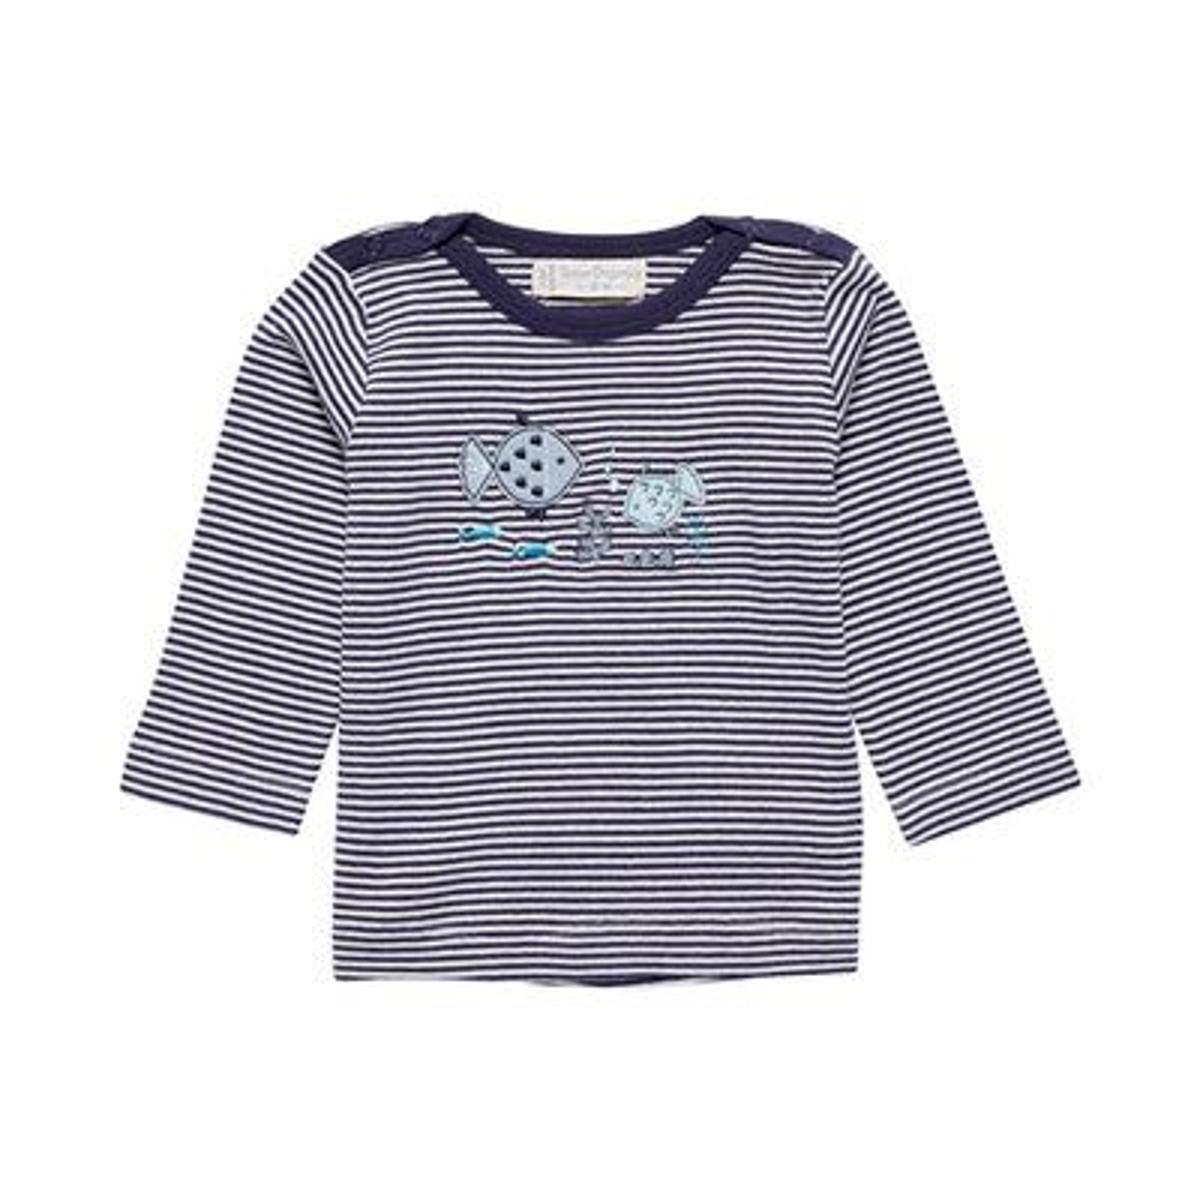 T-shirt à manches longues rayé poissons